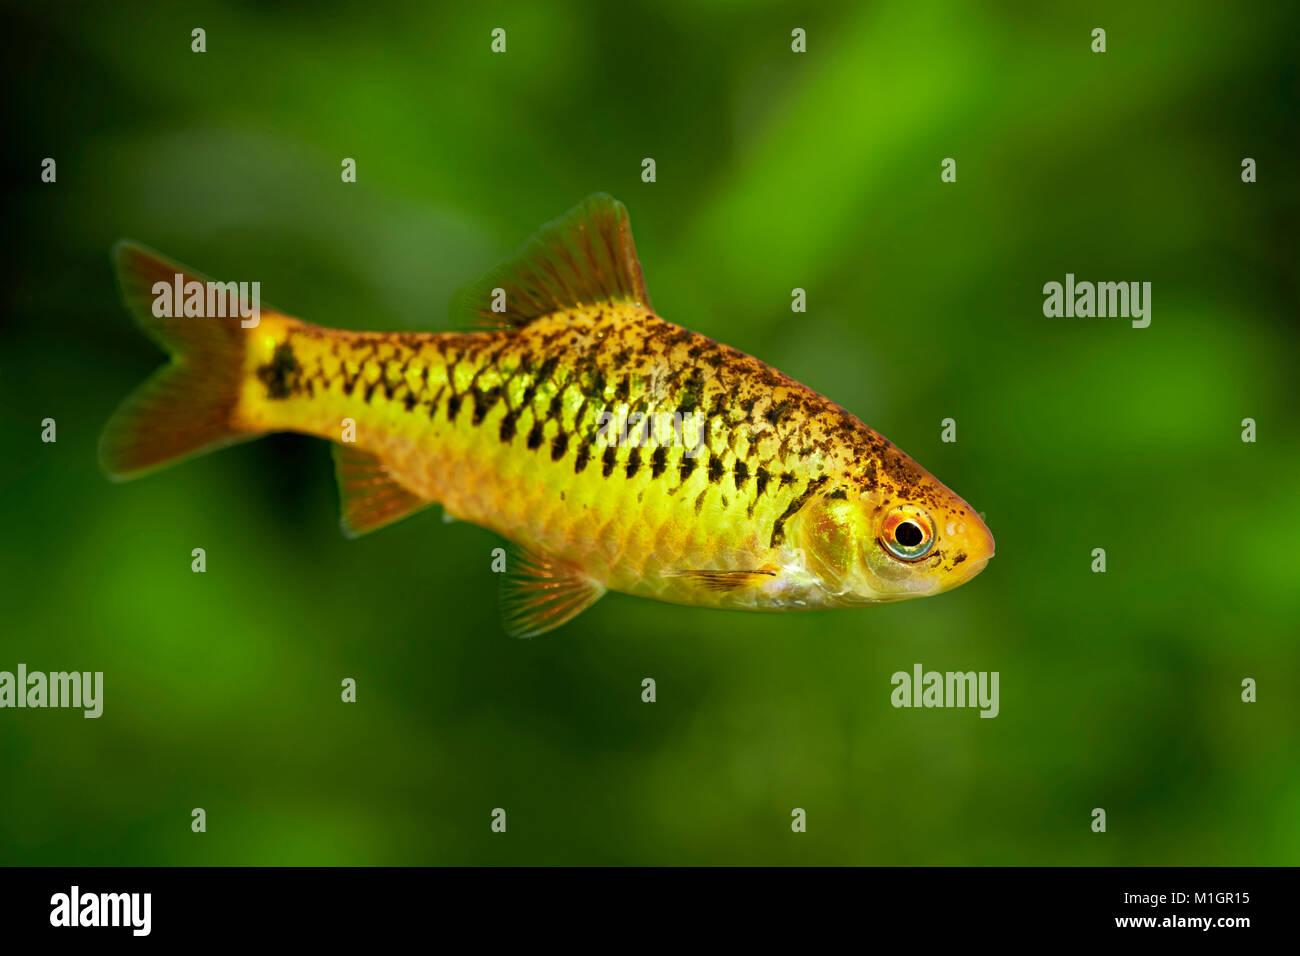 Chinese Barb (Barbodes semifasciolatus) in an aquarium . - Stock Image